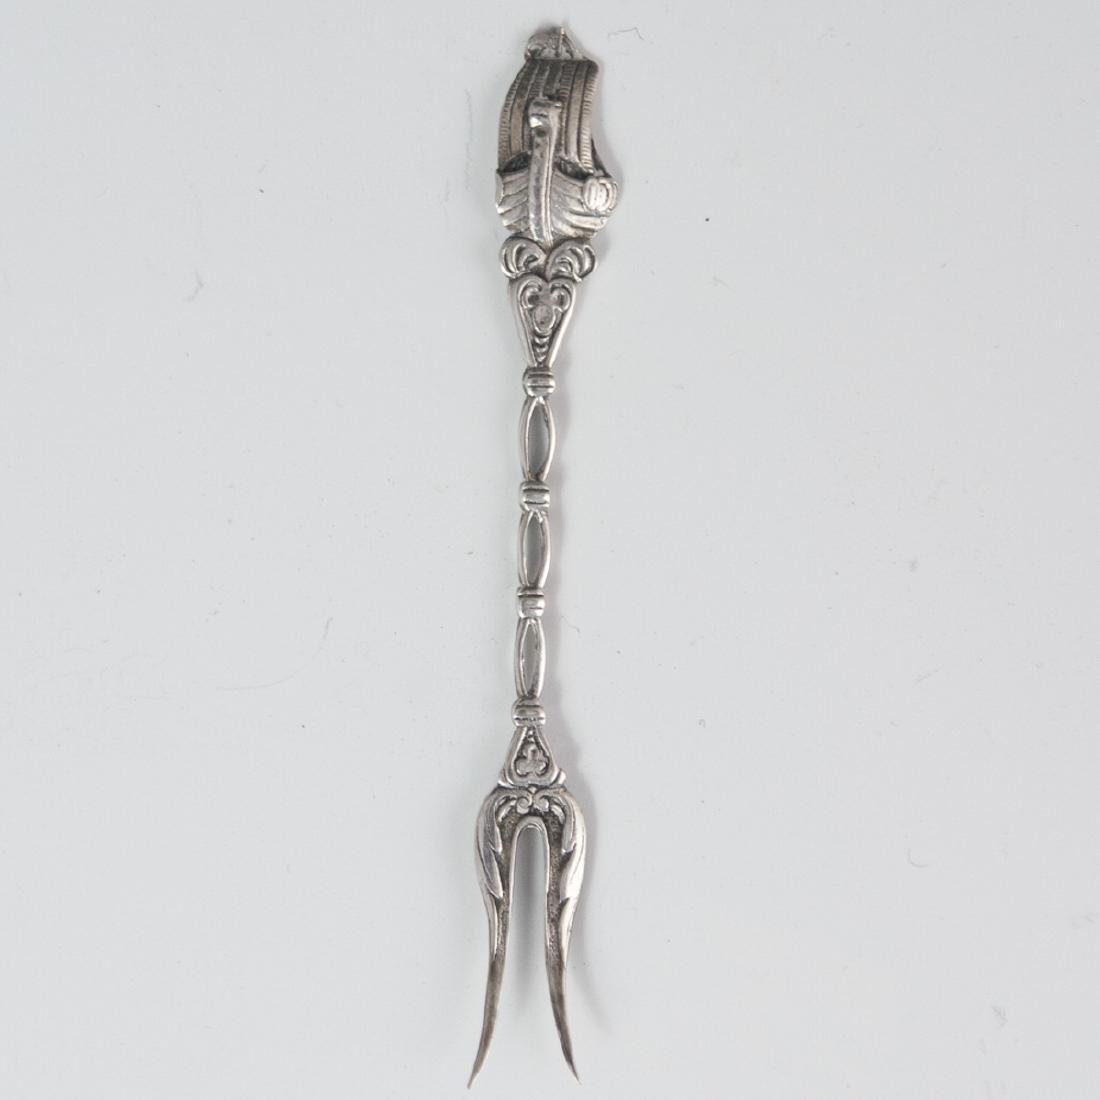 Antique Continental Silver